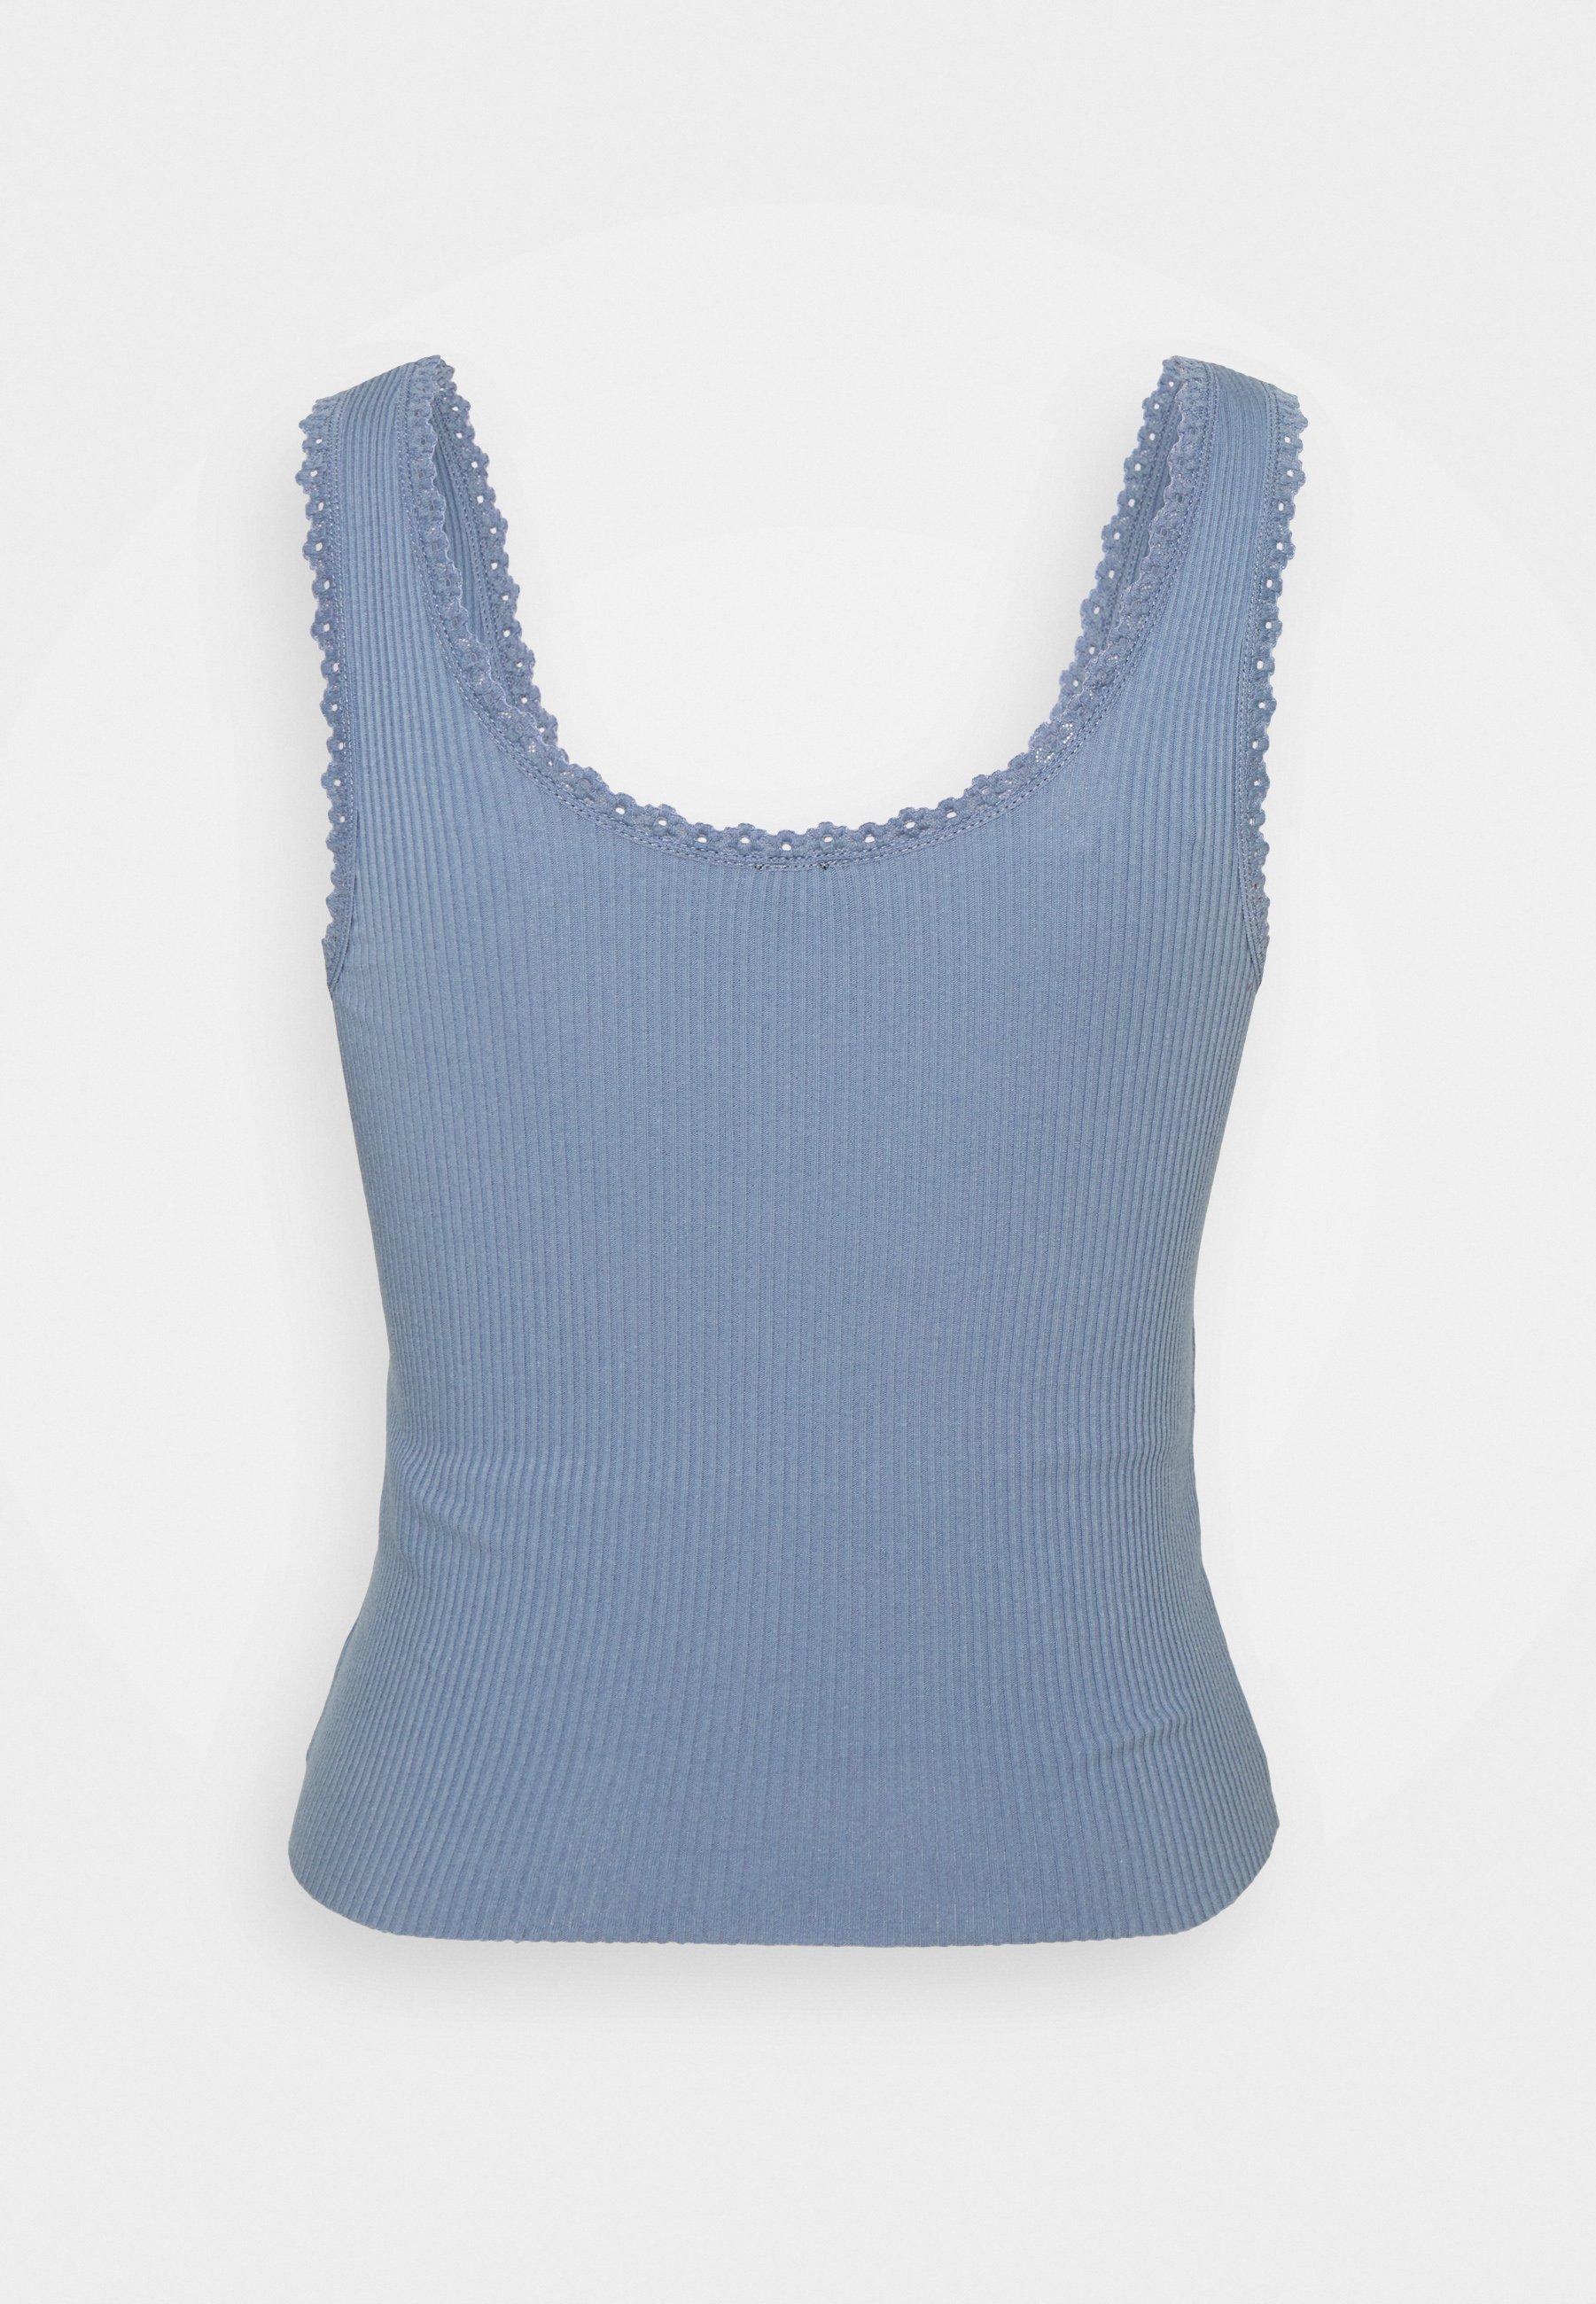 Bdg Urban Outfitters Picot Trim Vest - Topper Blue/blå